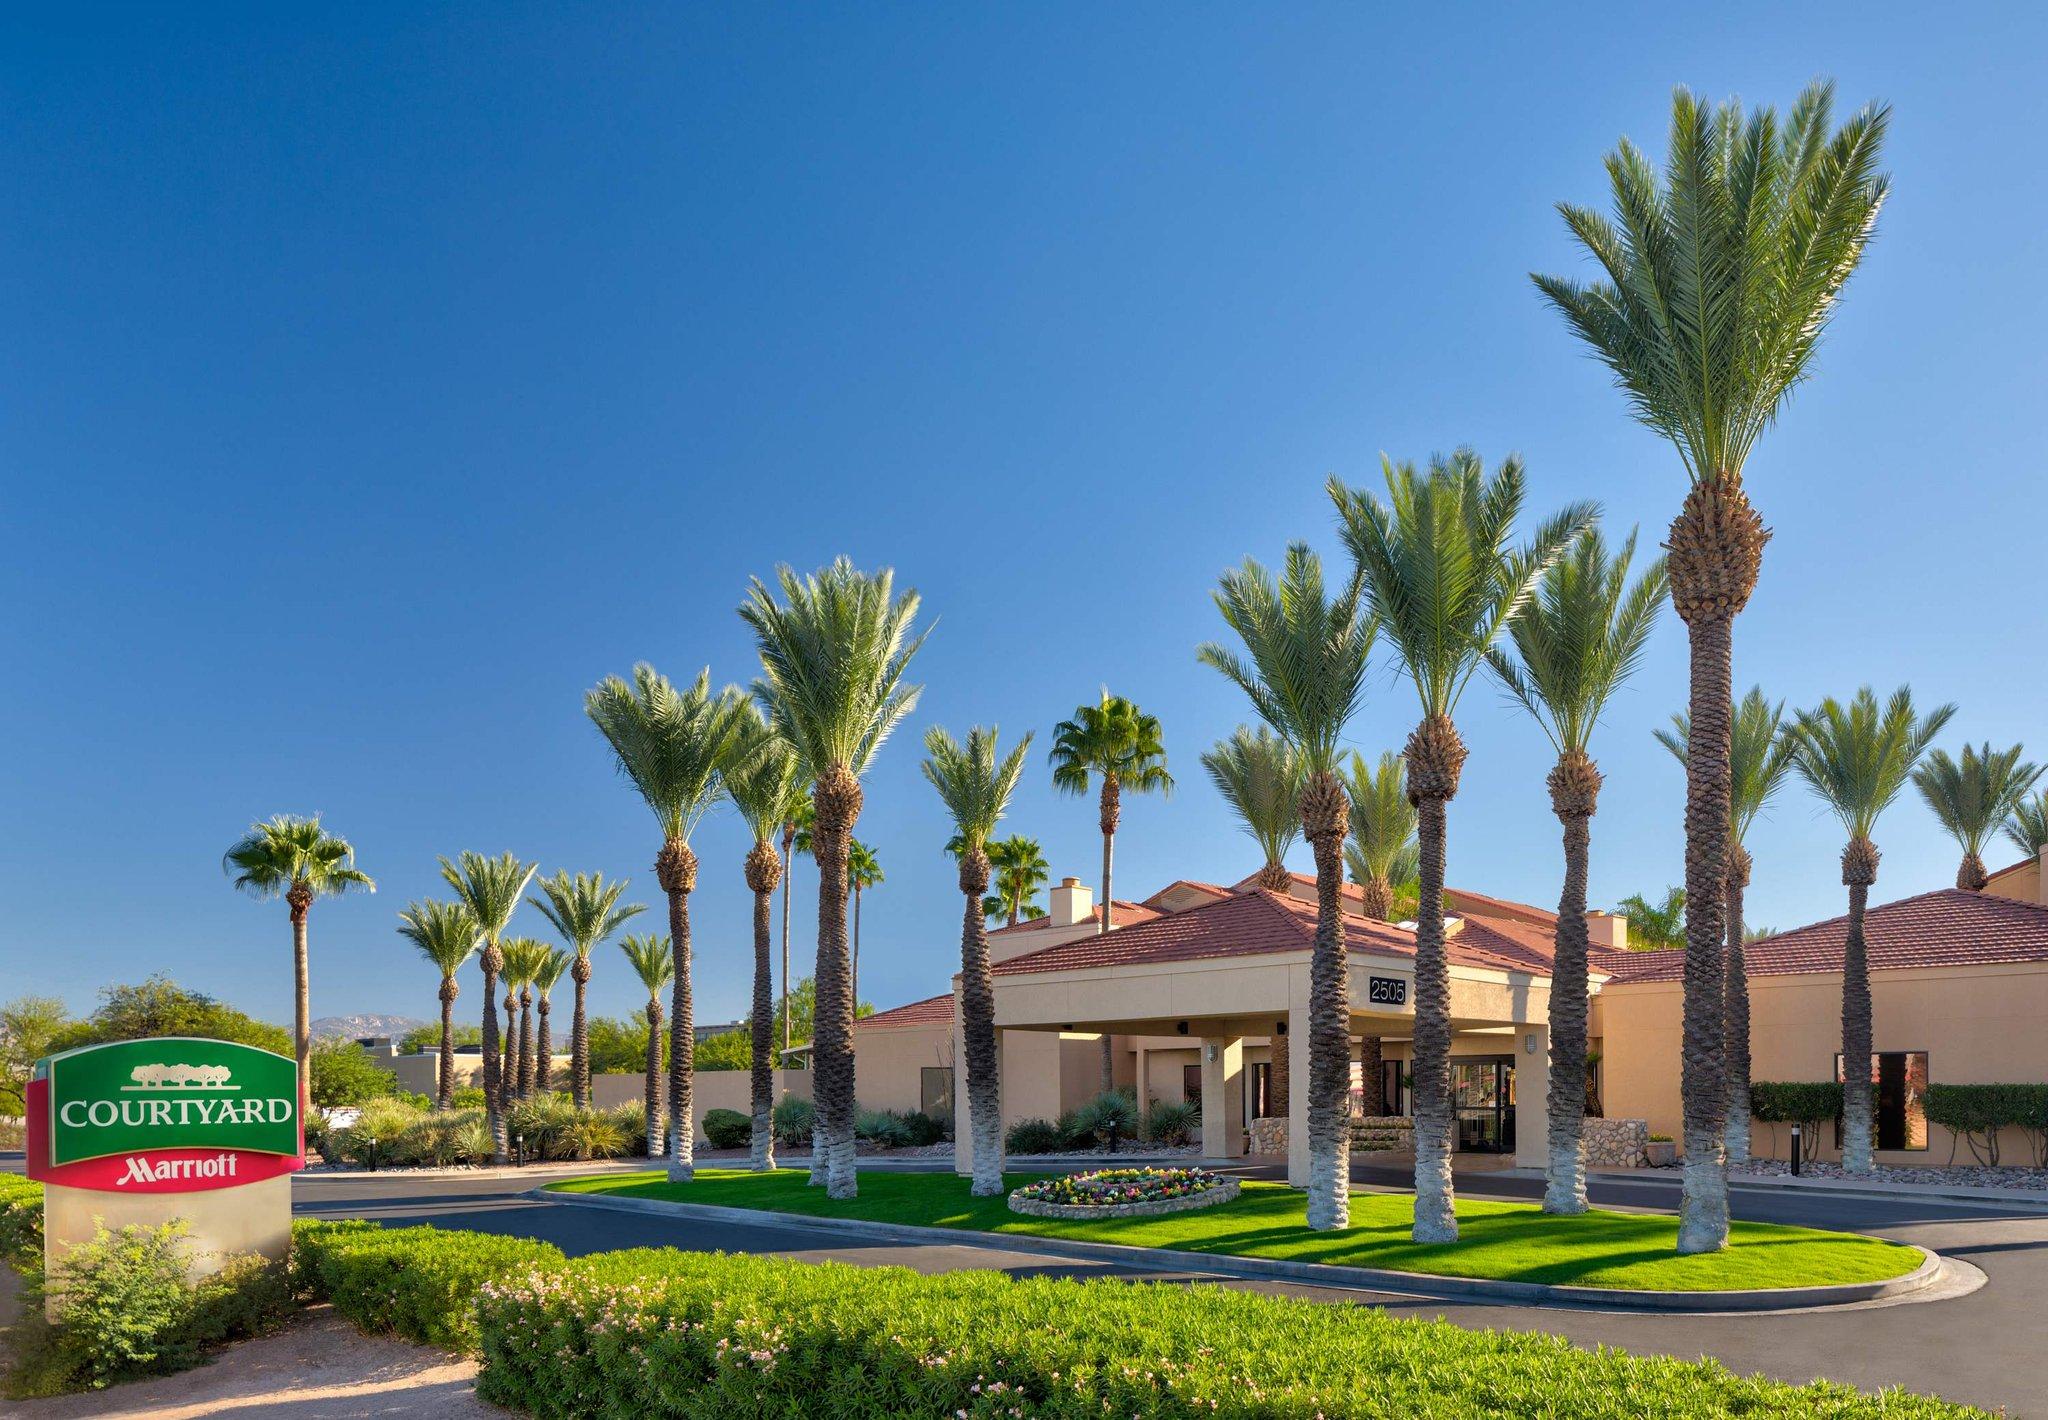 Courtyard Tucson Airport